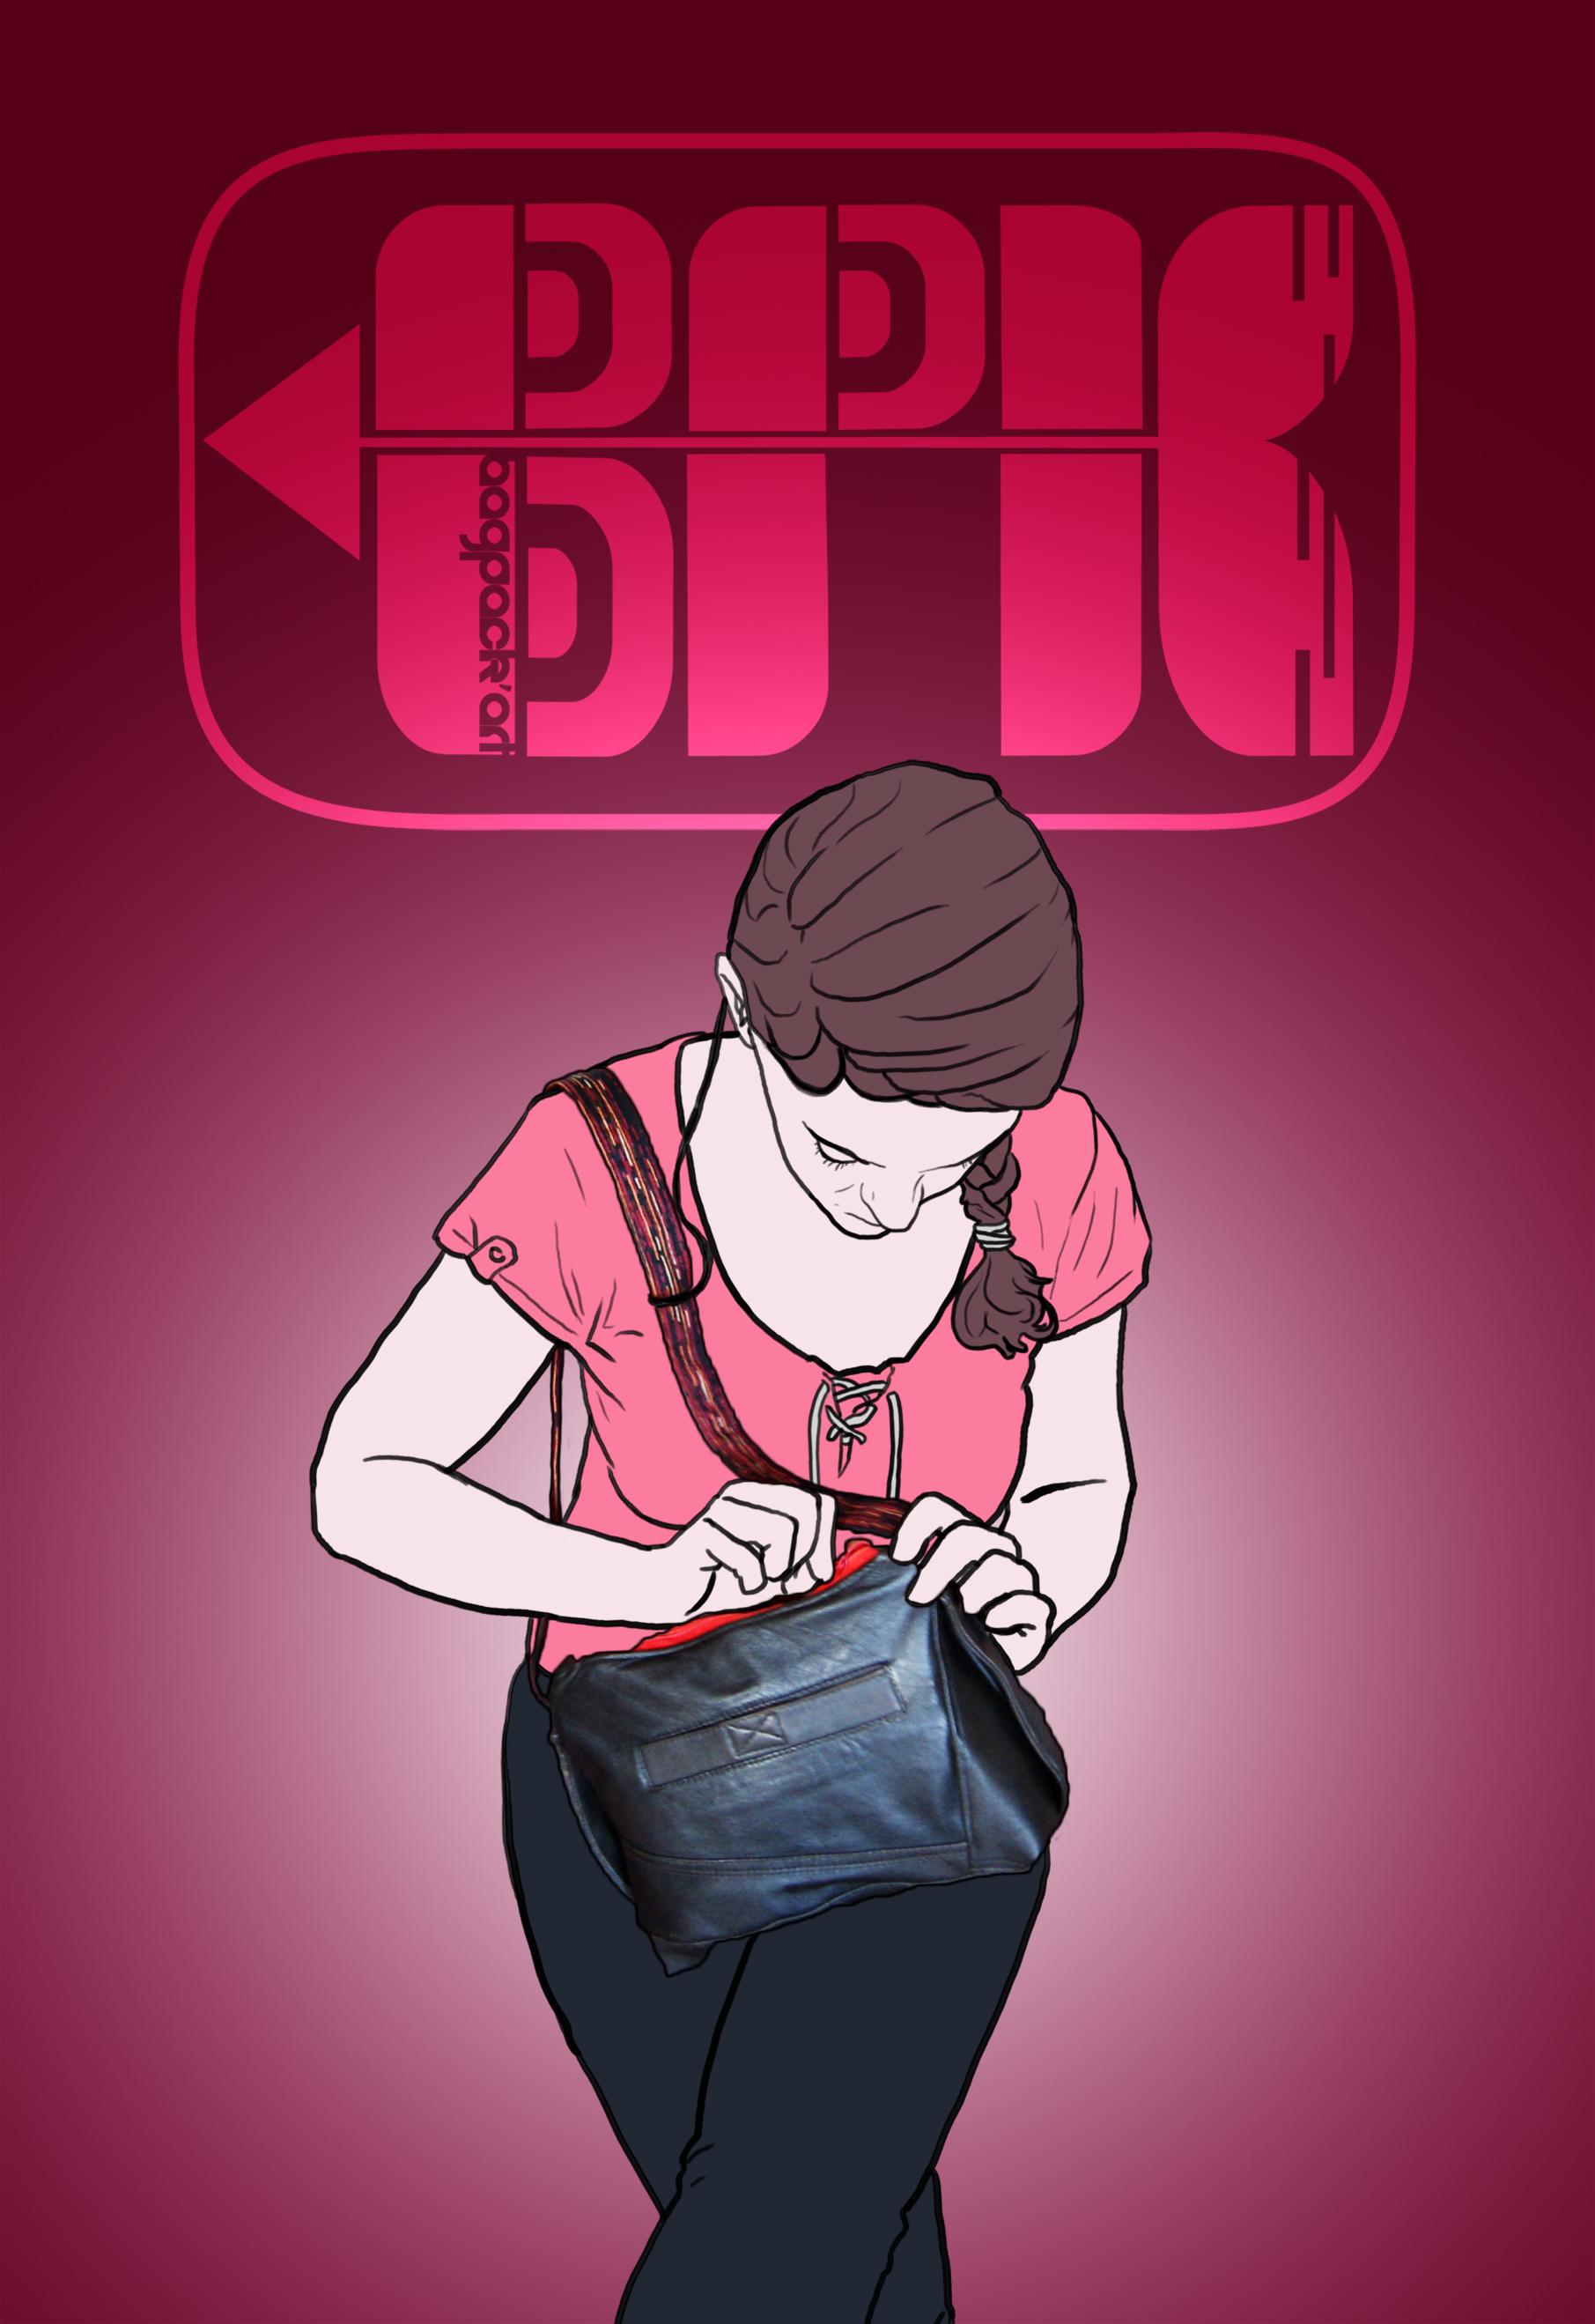 03_Urban bag